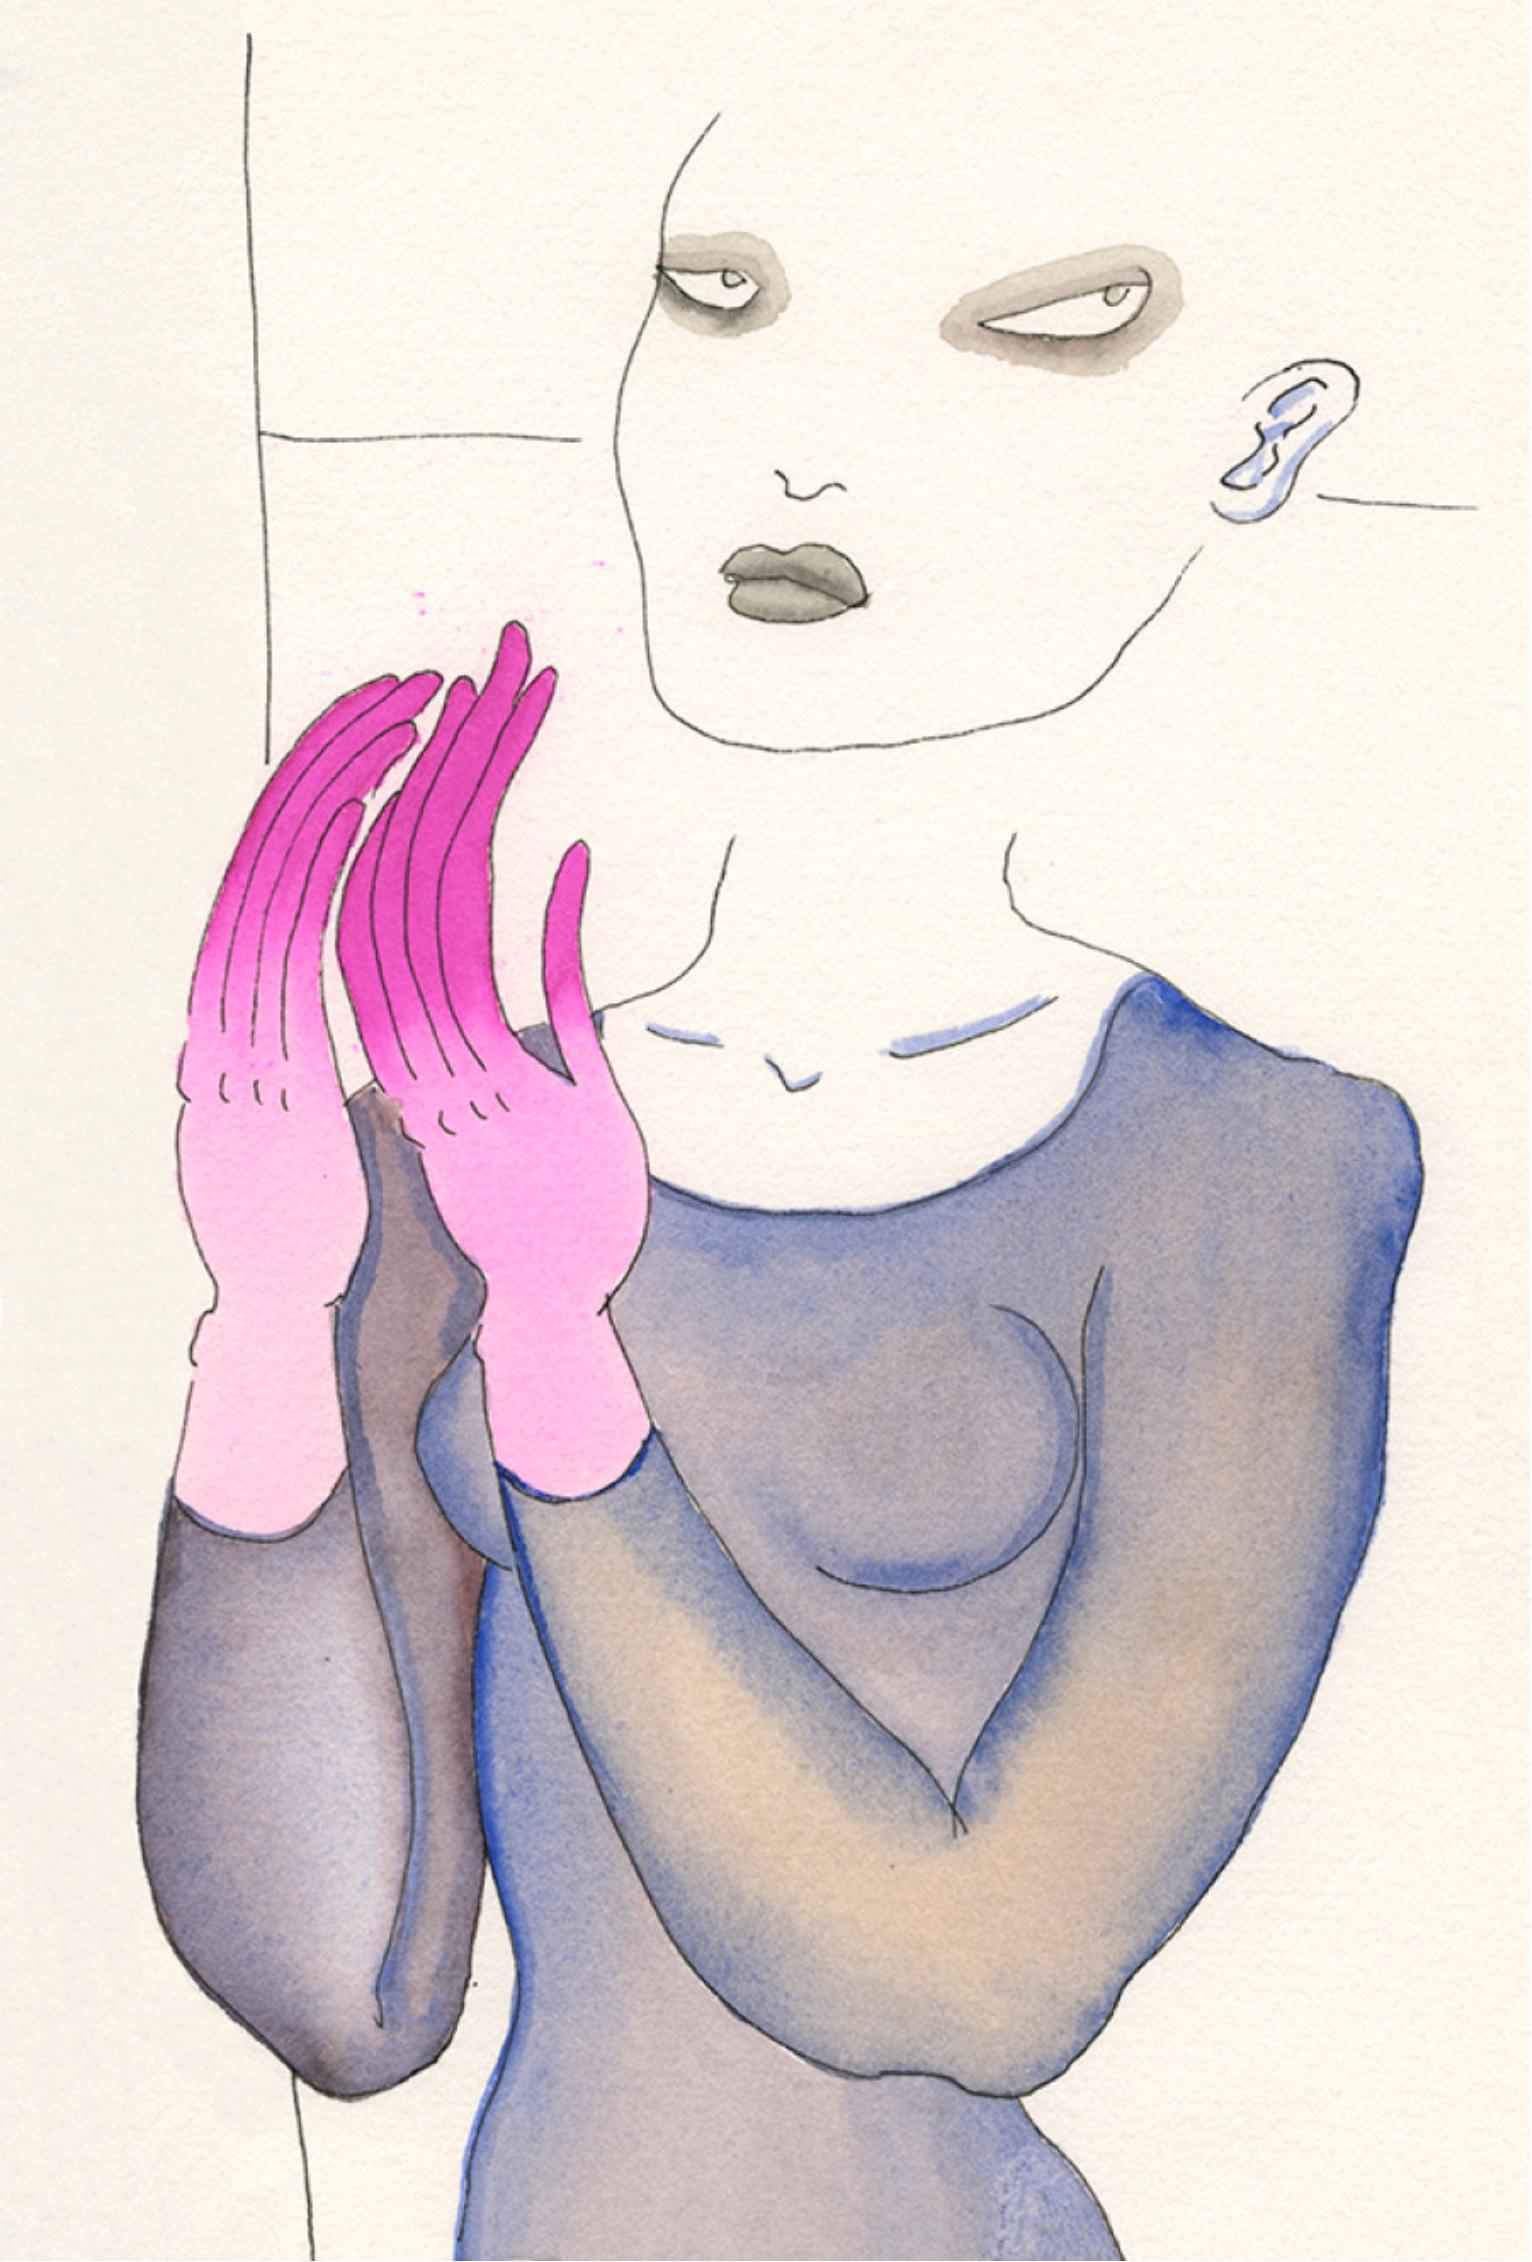 Sketchbook 91, 2008